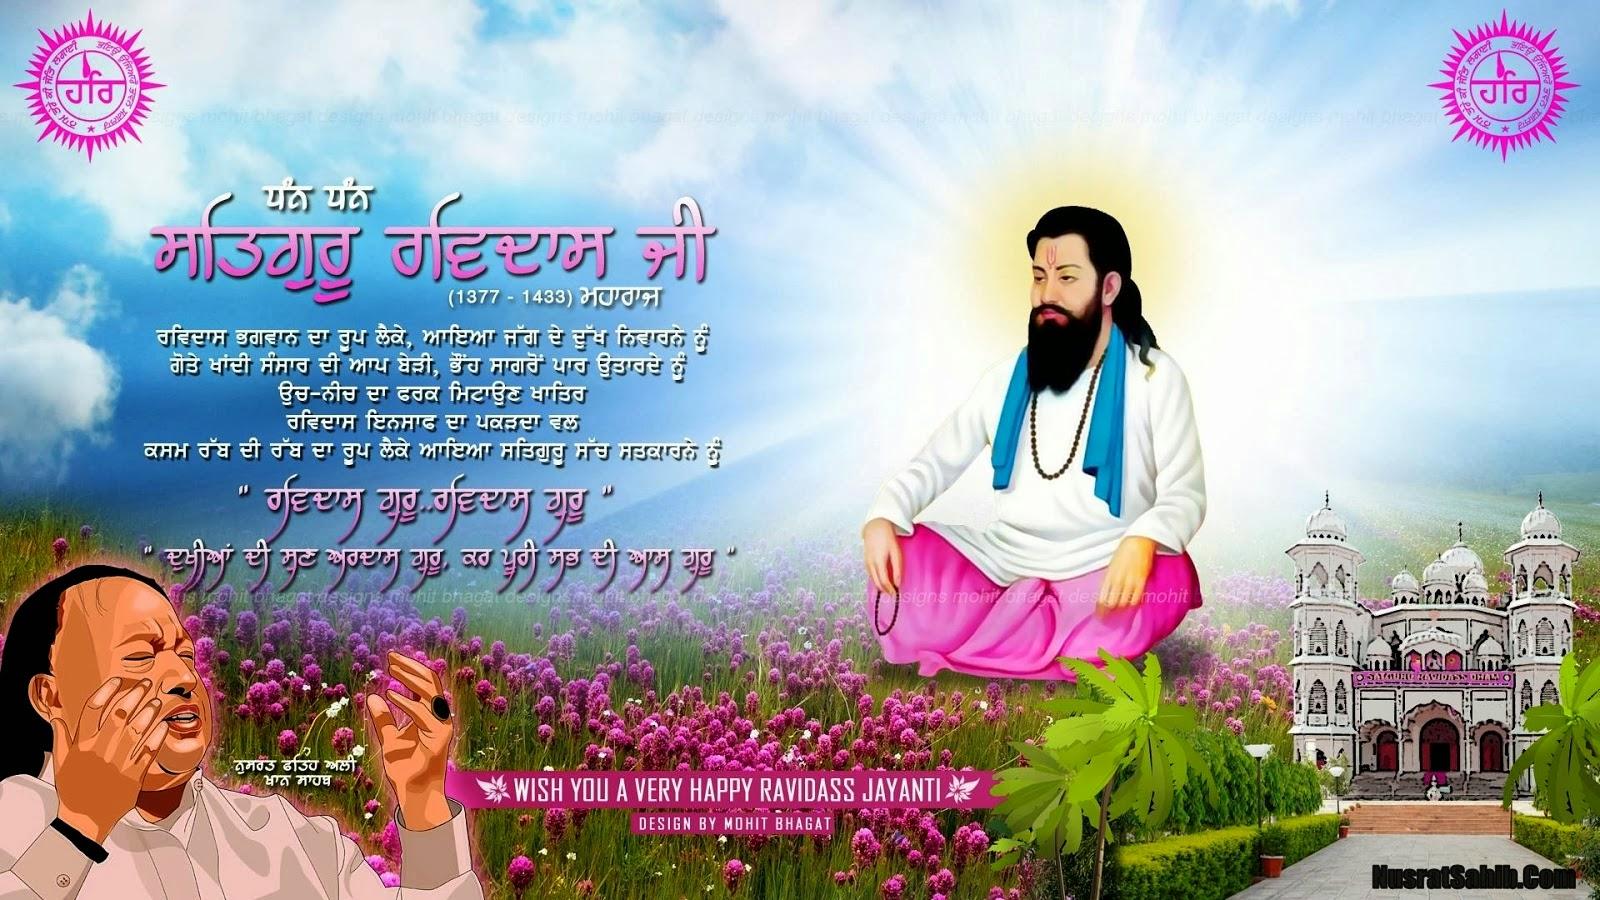 Guru Pai Sikhism Thy Name Is Love And Sacrifice Sri Guru Granth Nusratsahibcom Ravidas Guru Ravidas Guru Lyrics Nusrat Fateh Ali